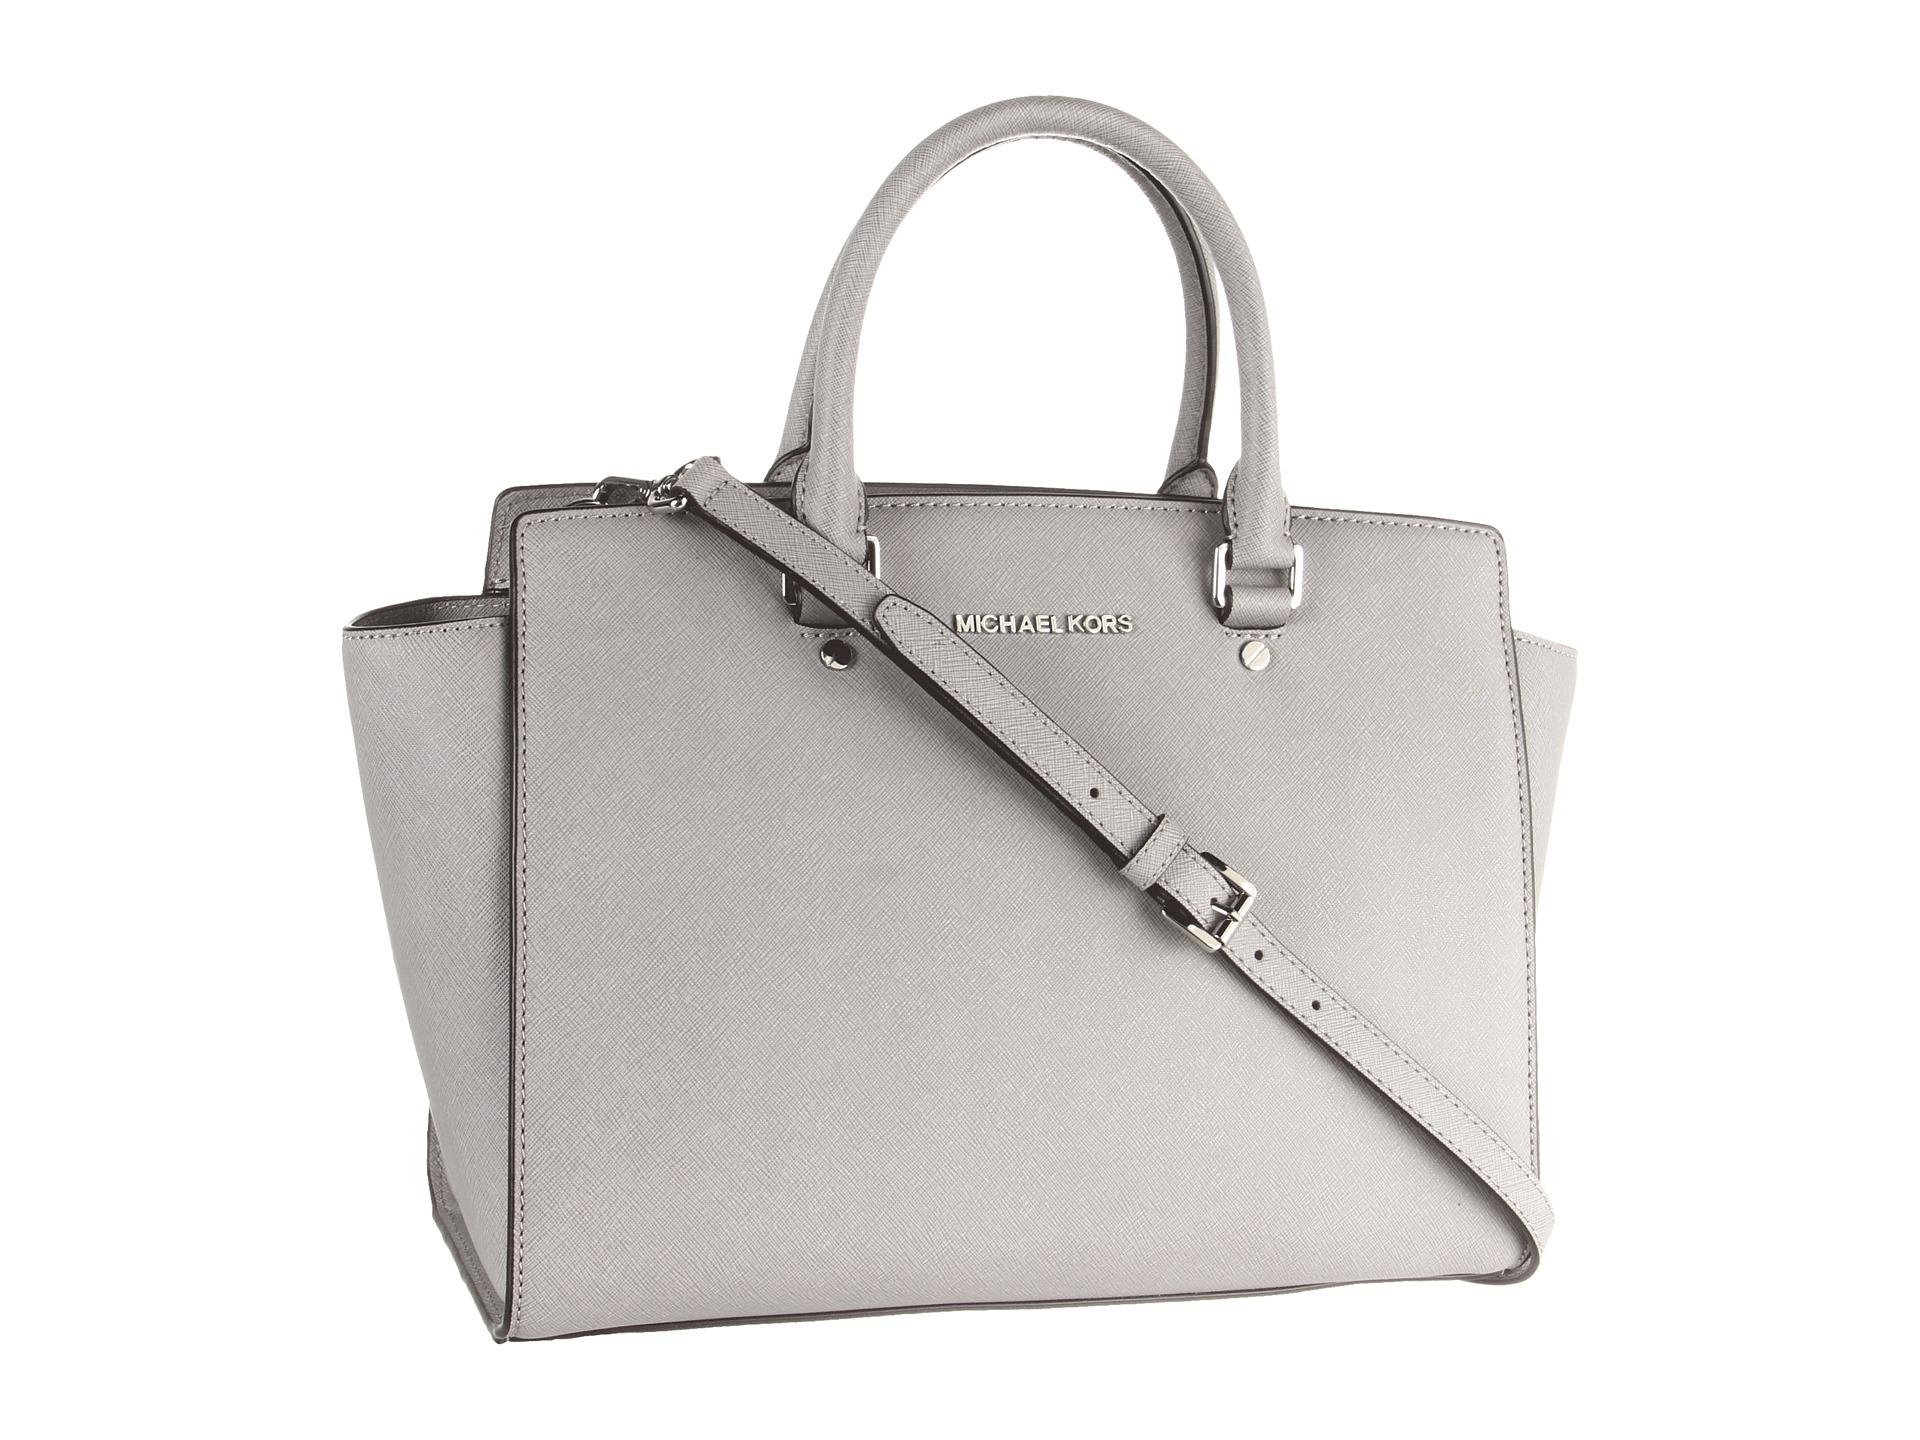 michael michael kors selma large tz satchel in gray pearl grey. Black Bedroom Furniture Sets. Home Design Ideas